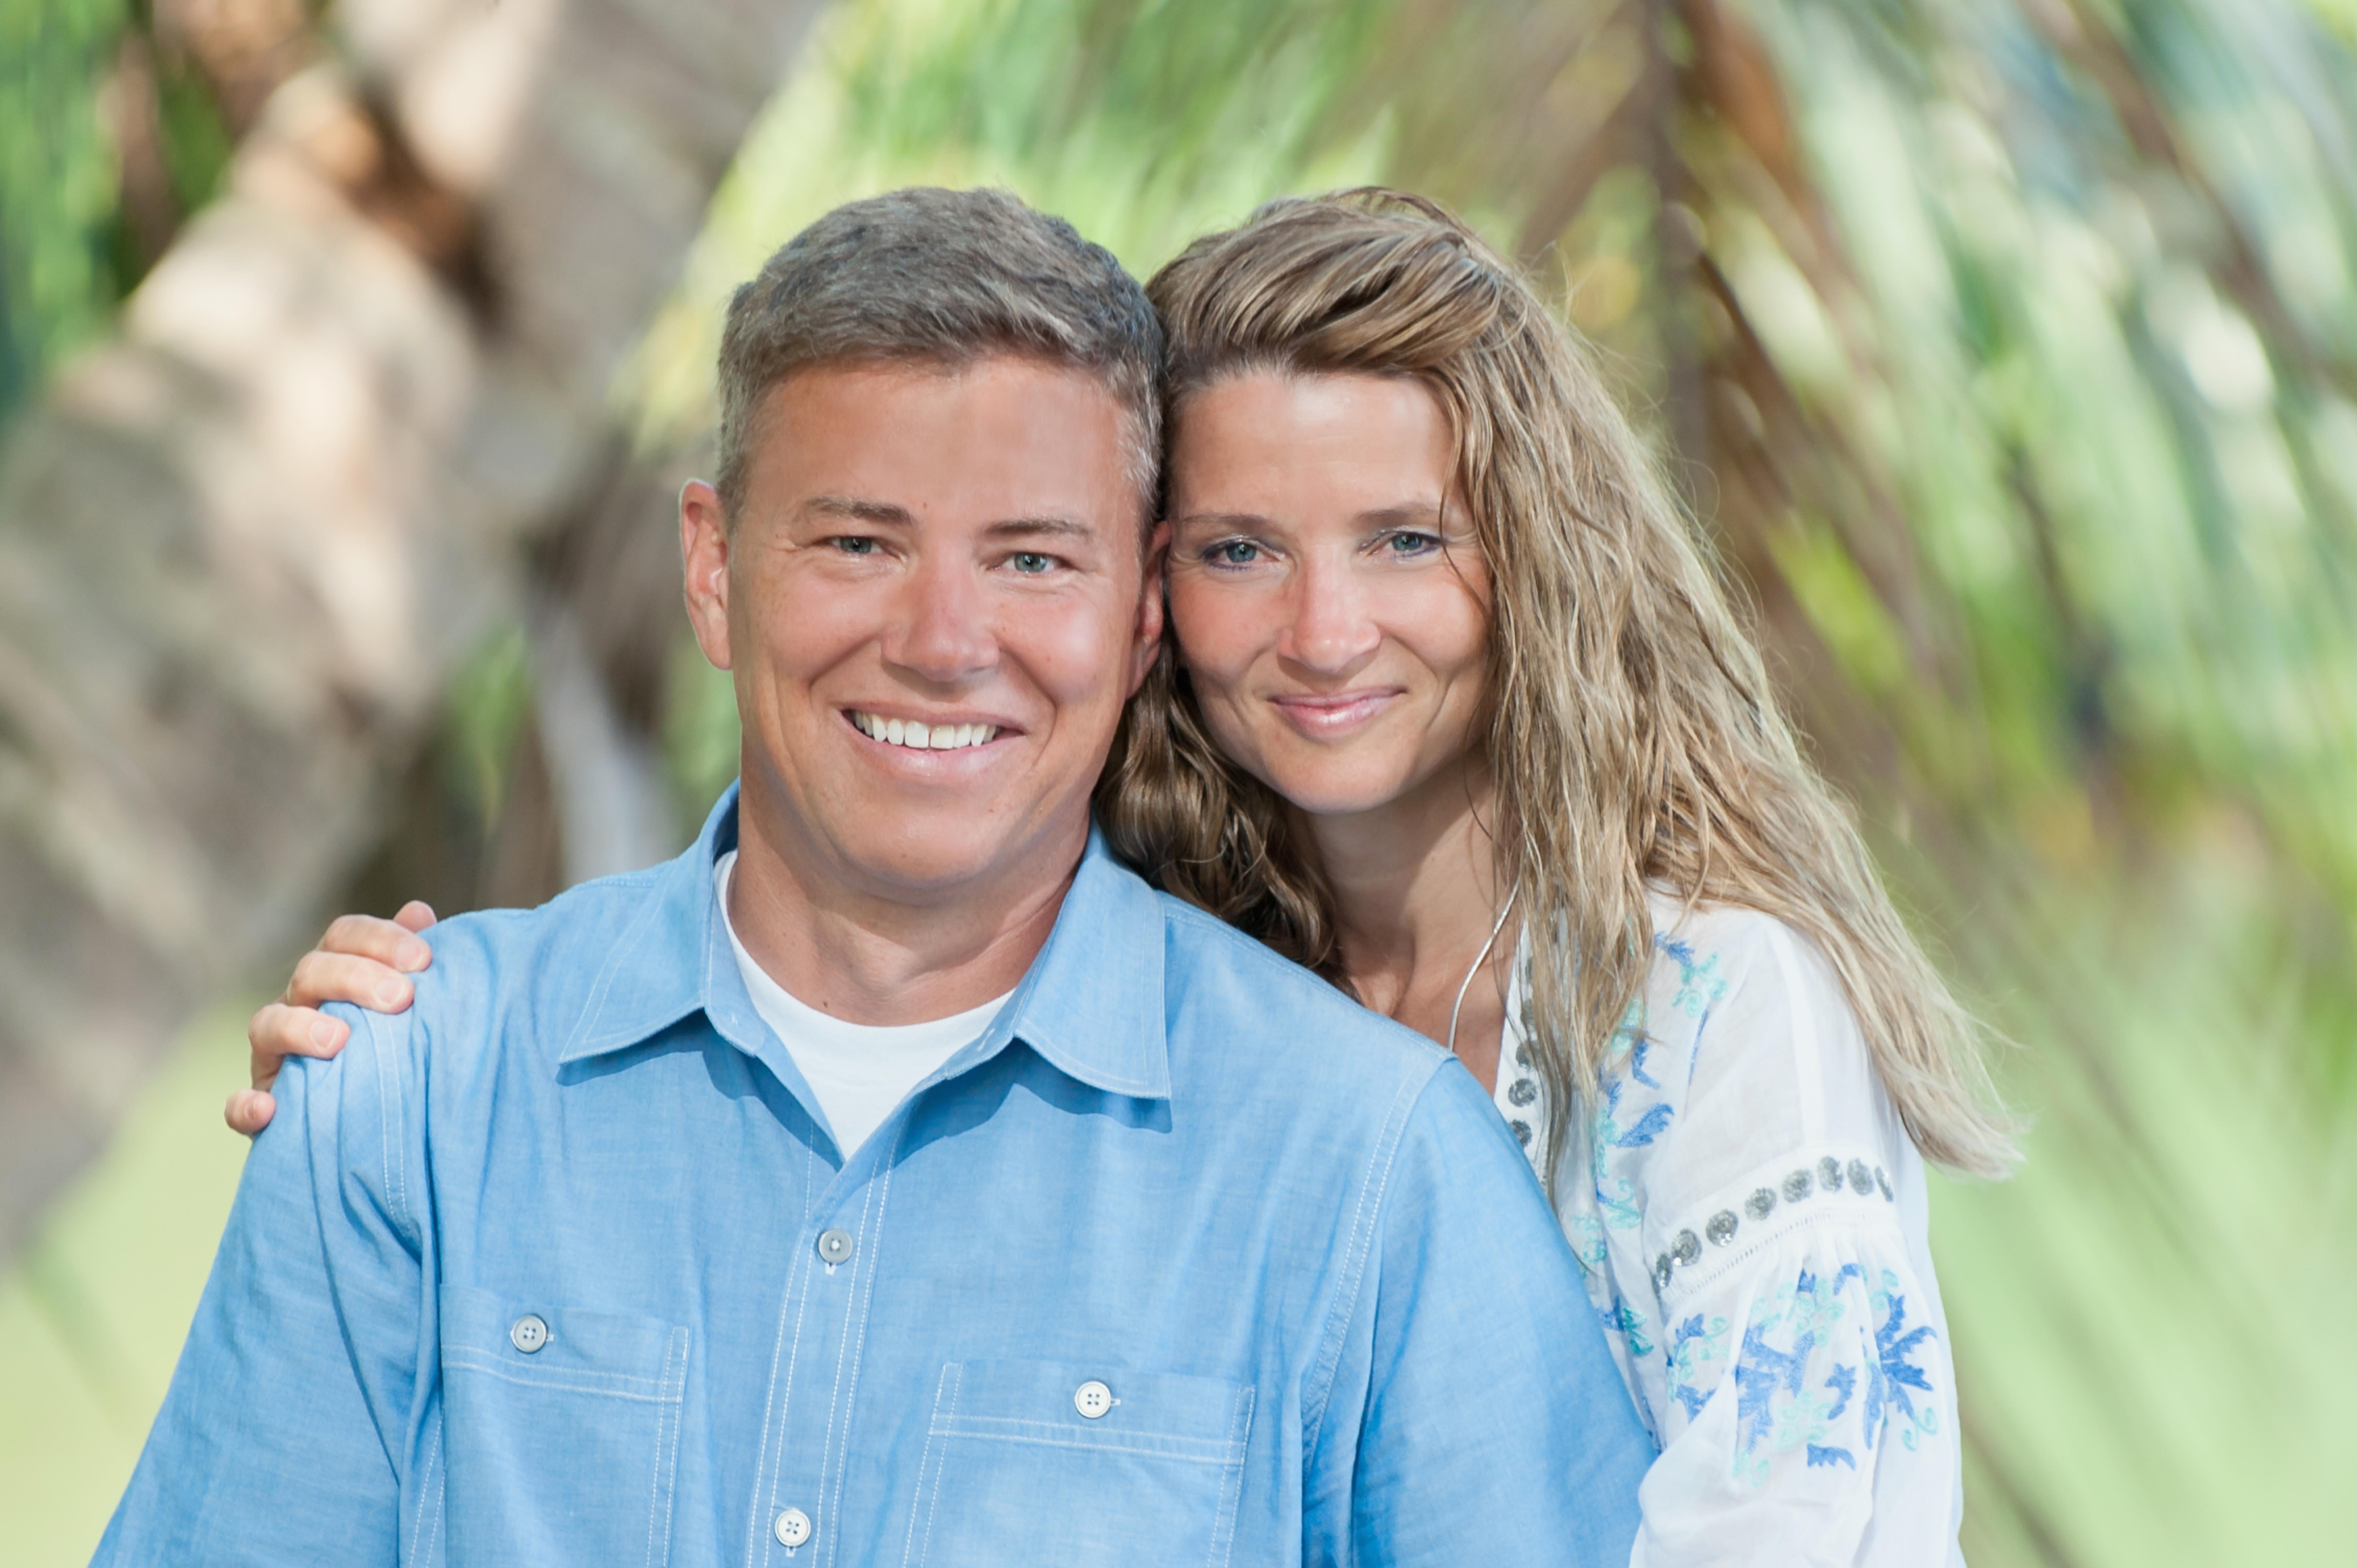 Kauai Family Portrait photographers